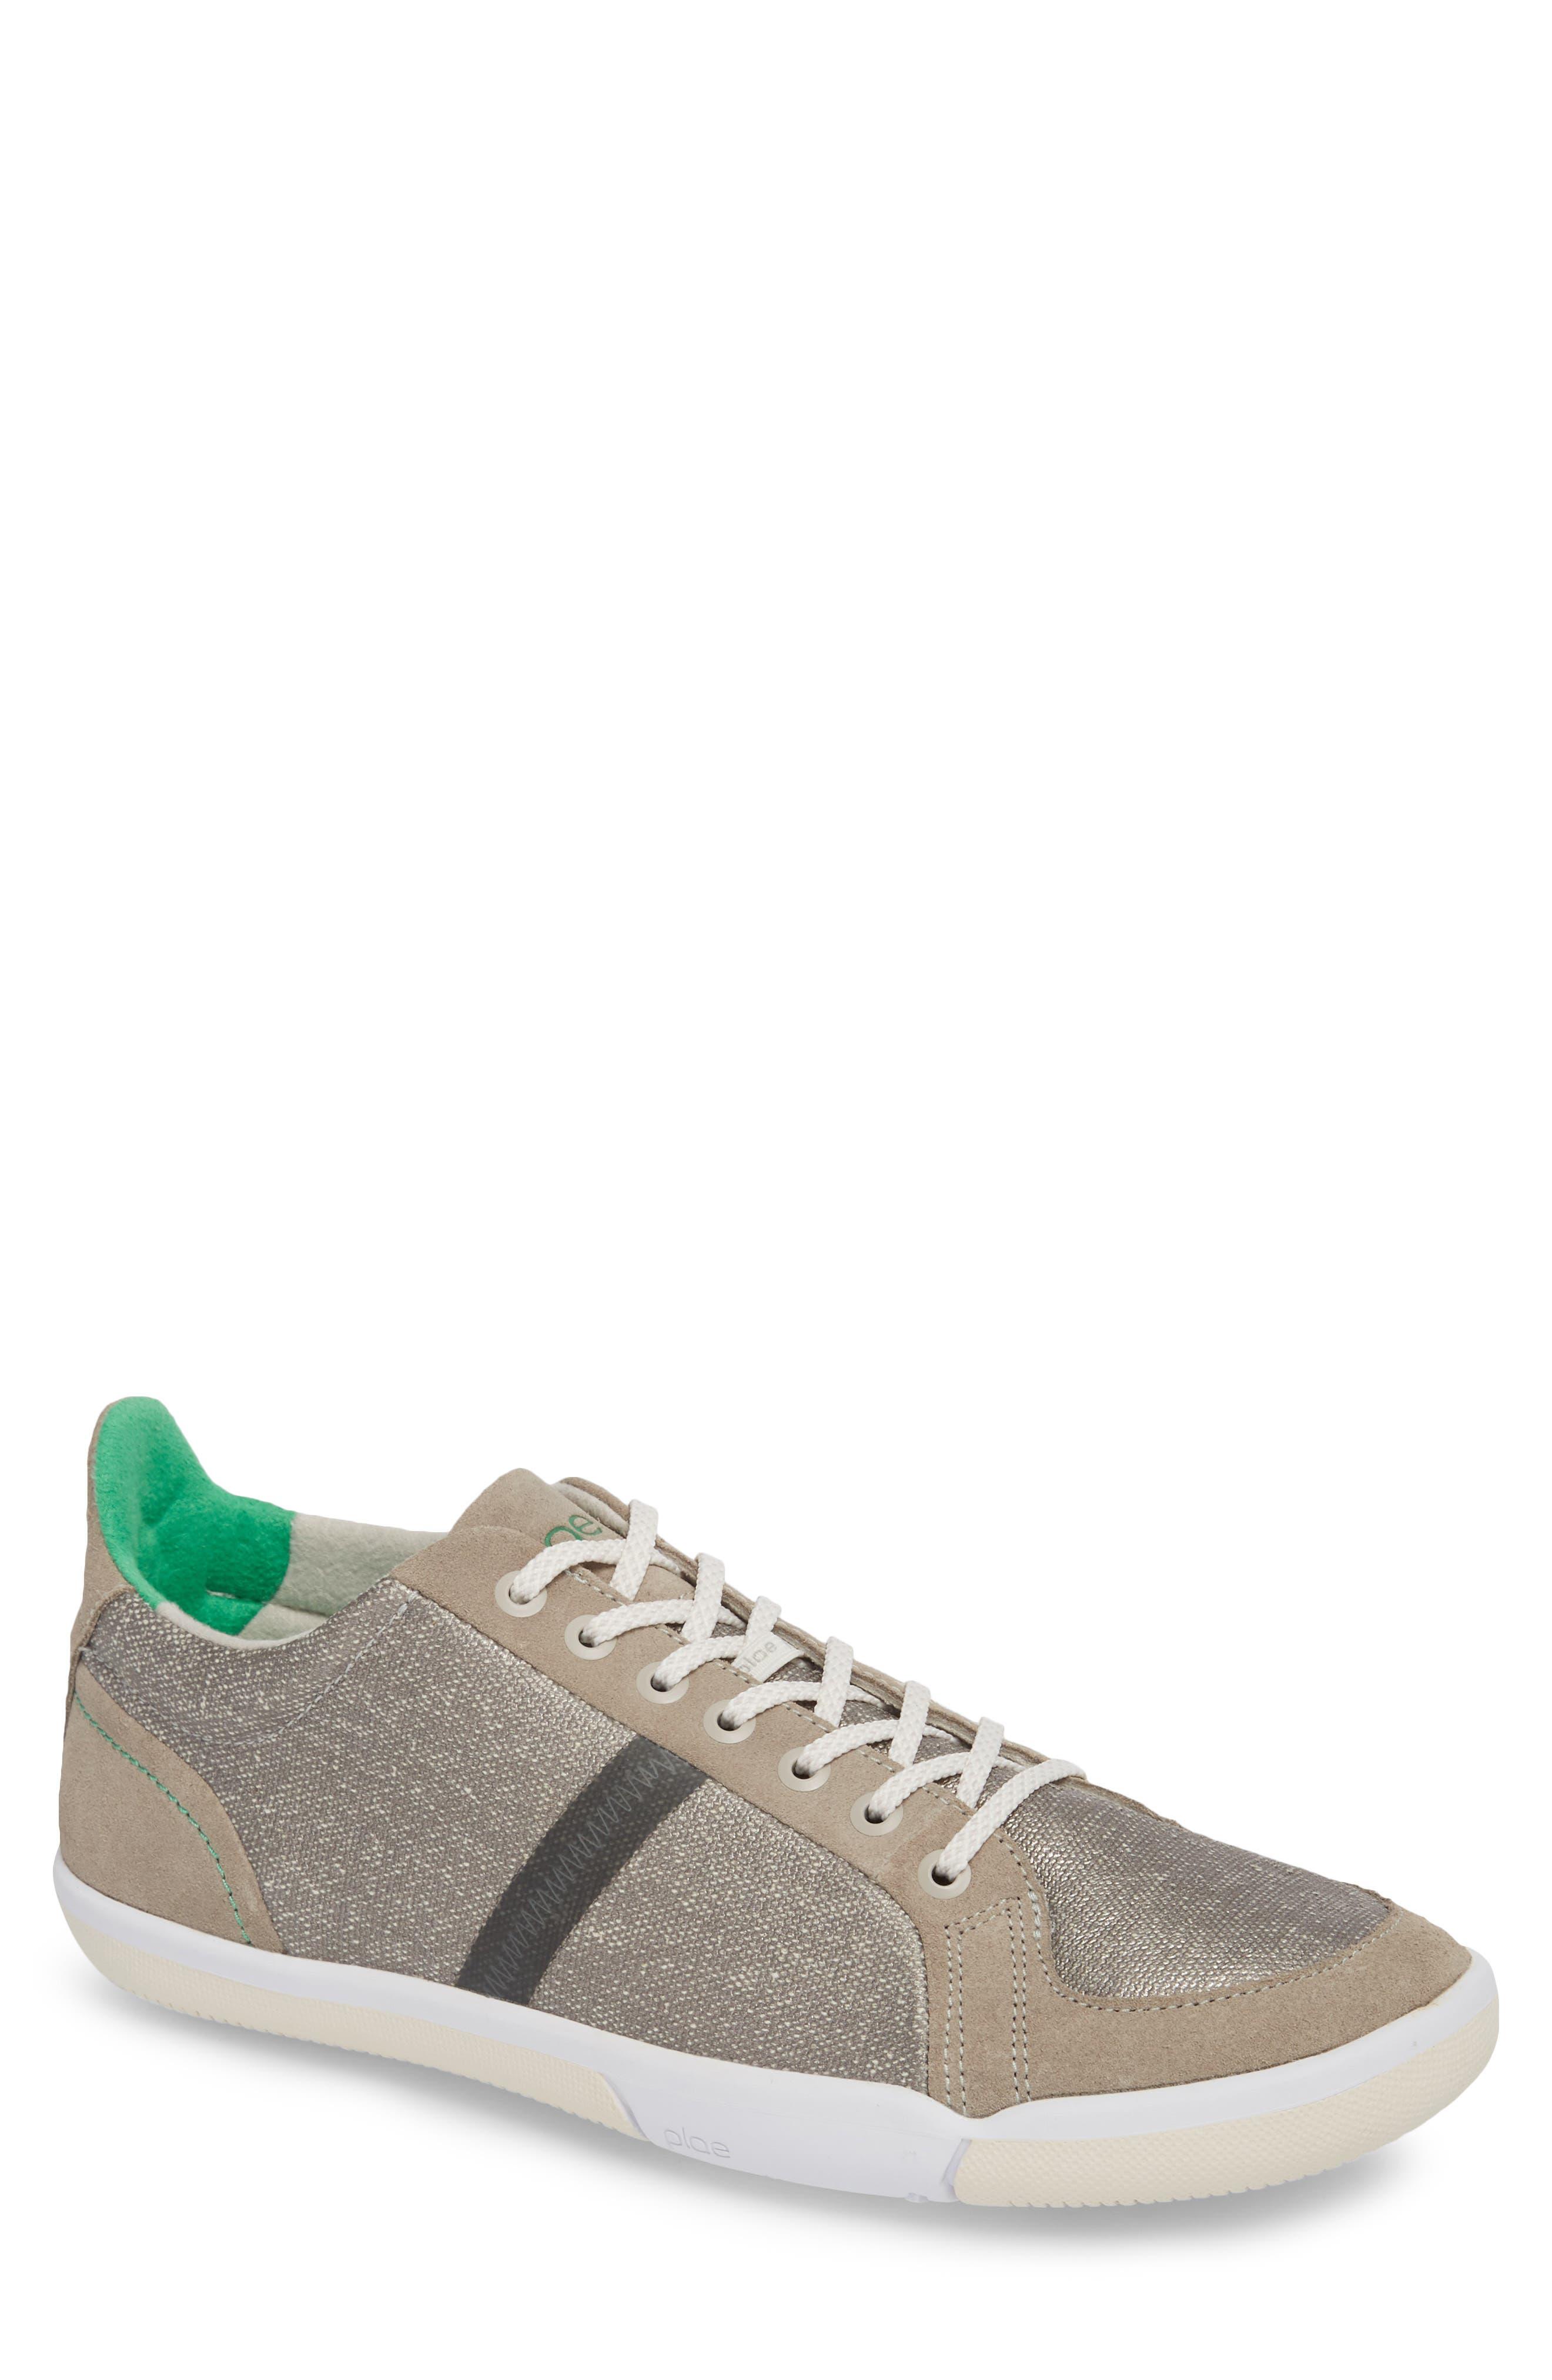 Prospect Low Top Sneaker,                             Main thumbnail 1, color,                             Stone